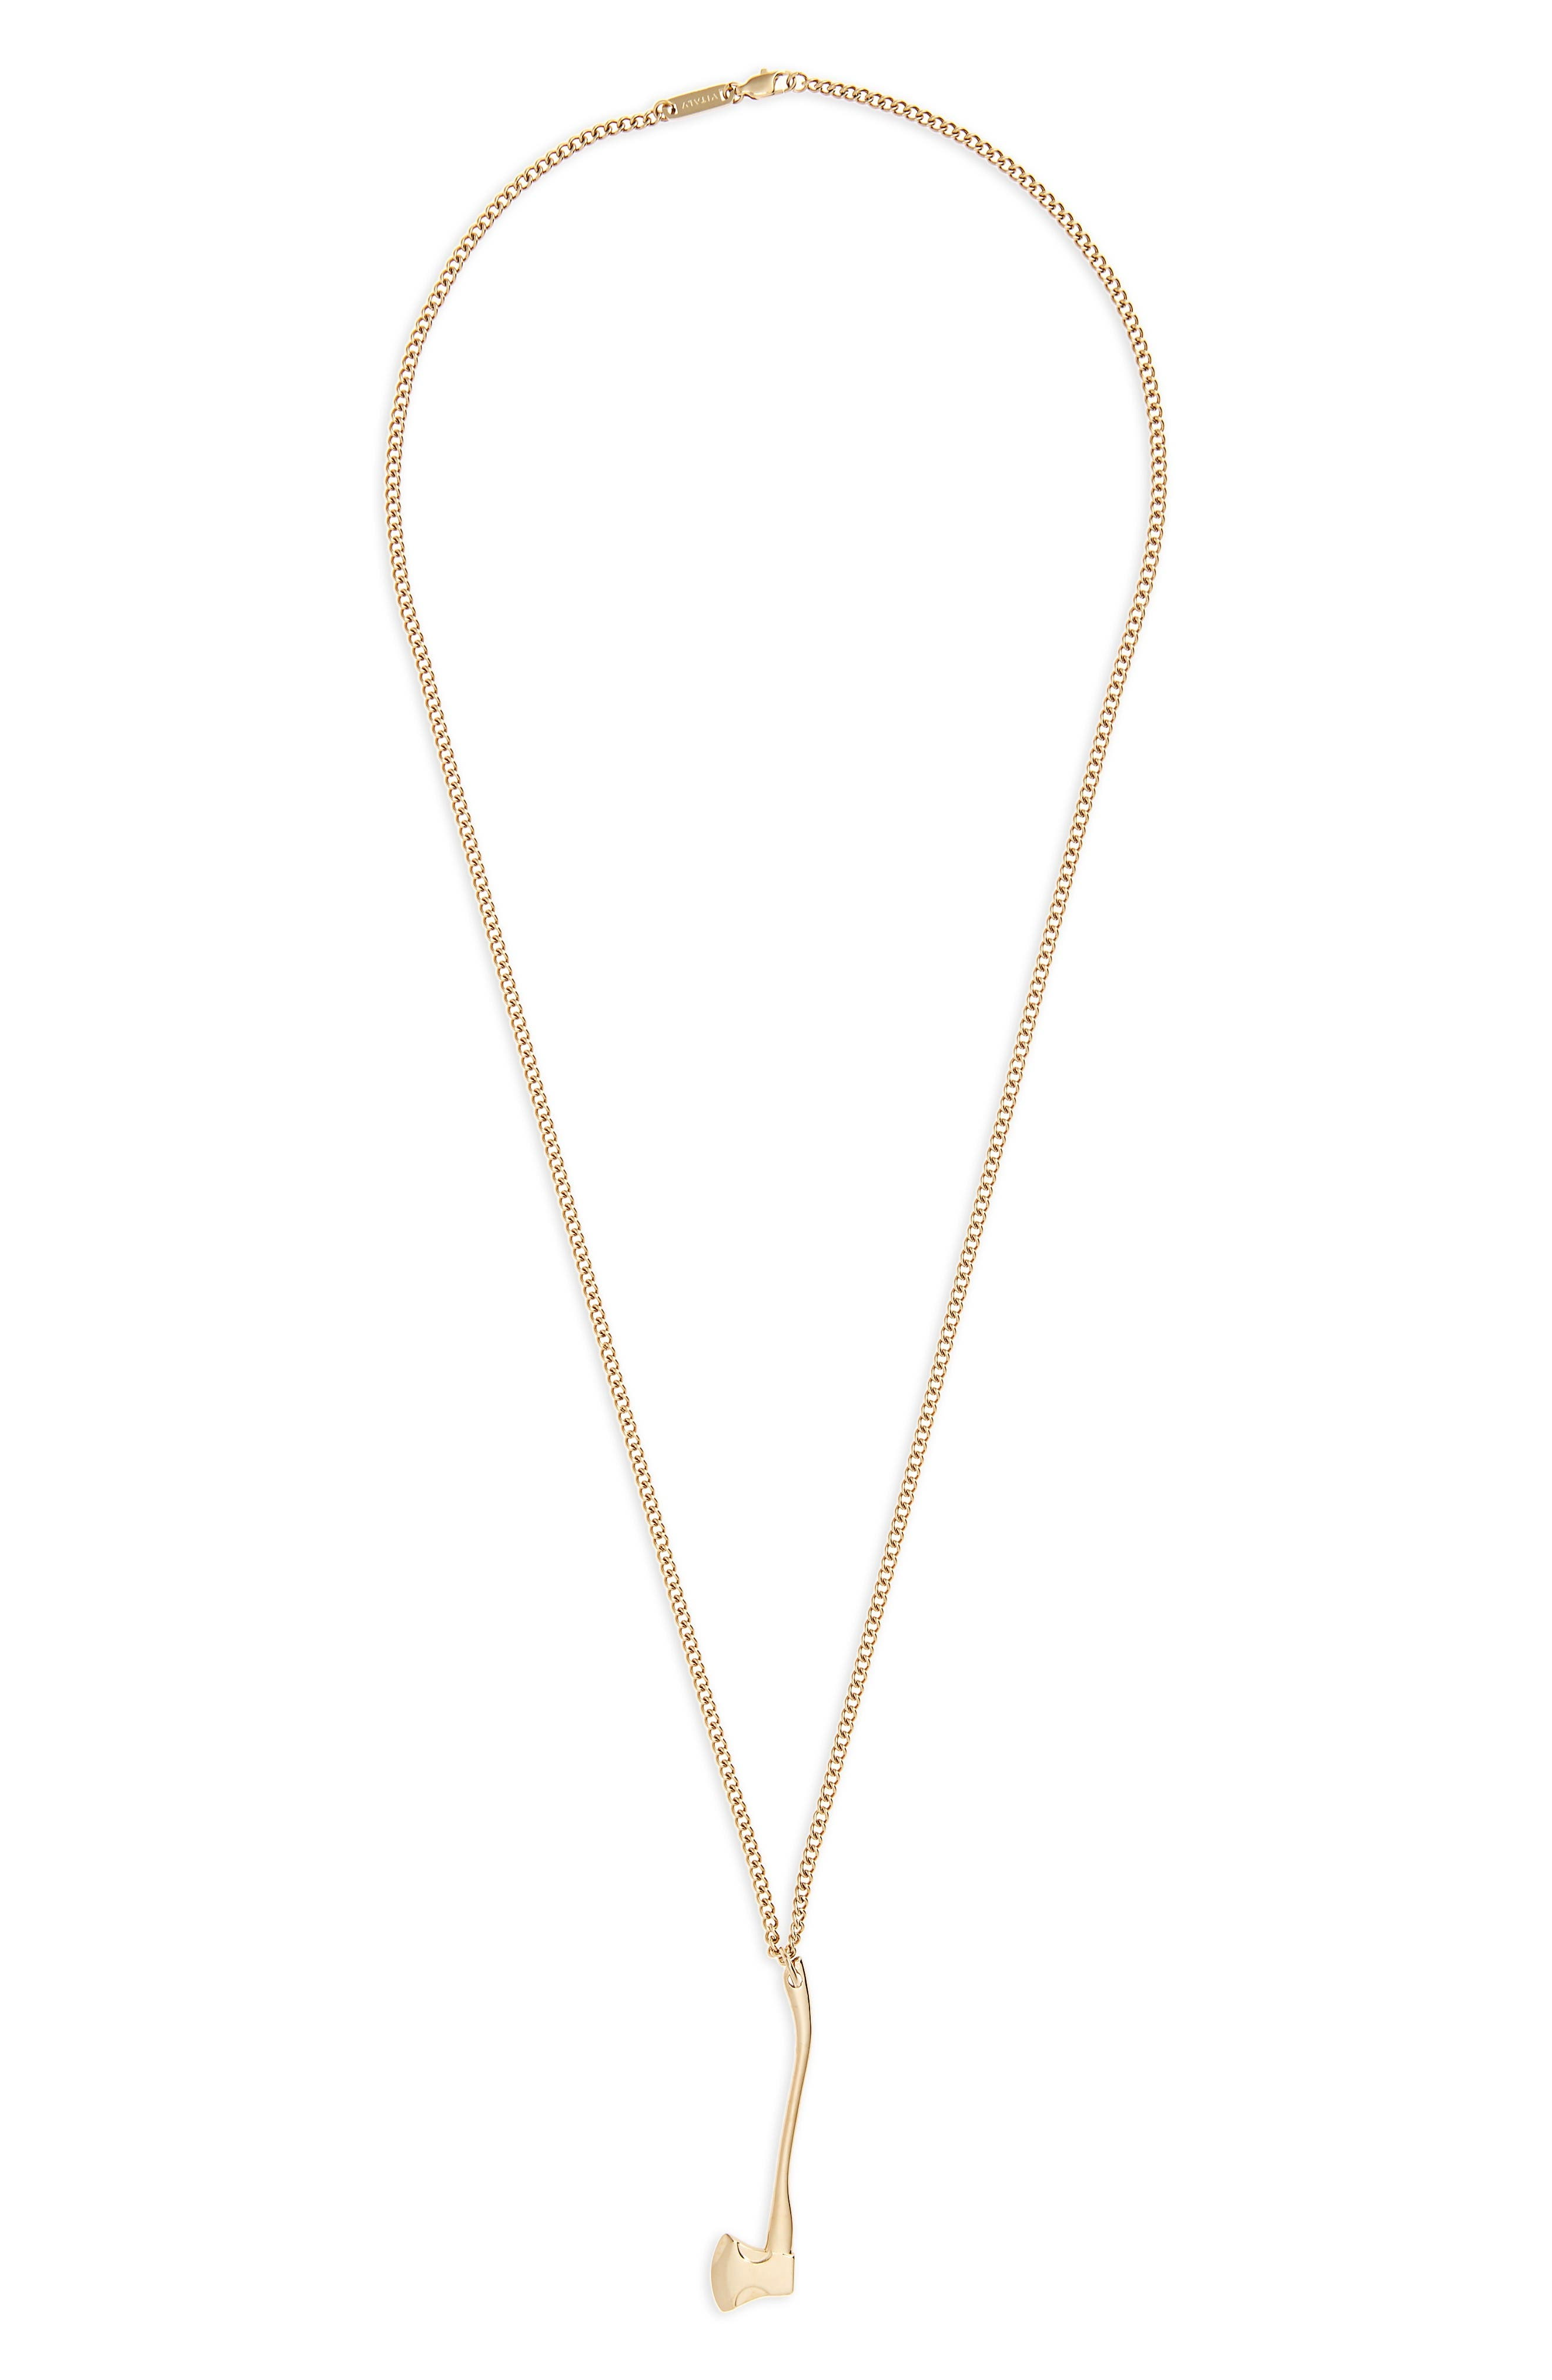 Vitaly Sequoia Pendant Necklace